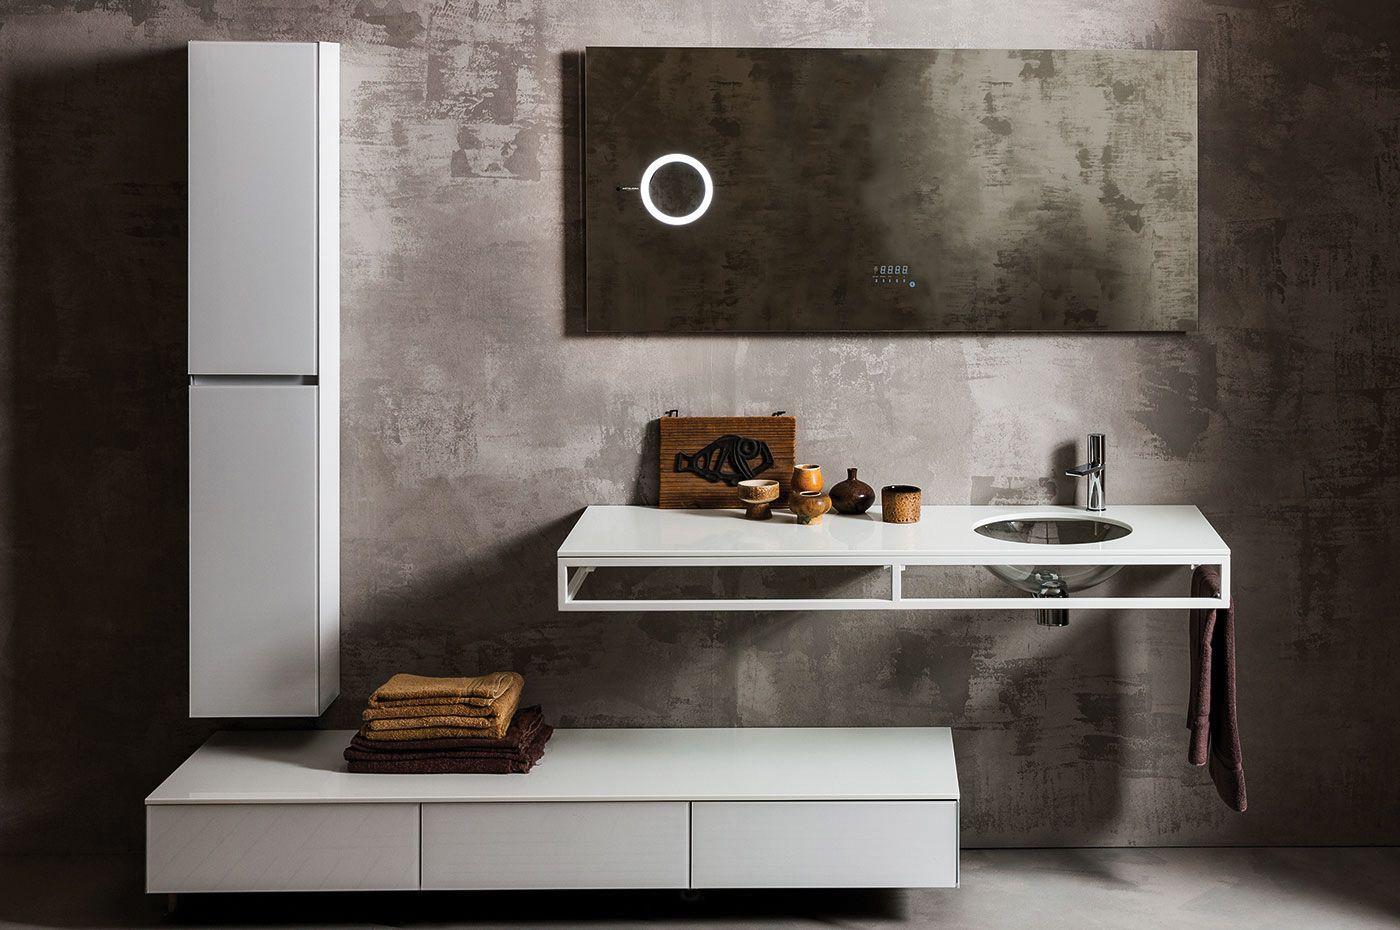 Top 10: Elegantly Simple Furniture Selections